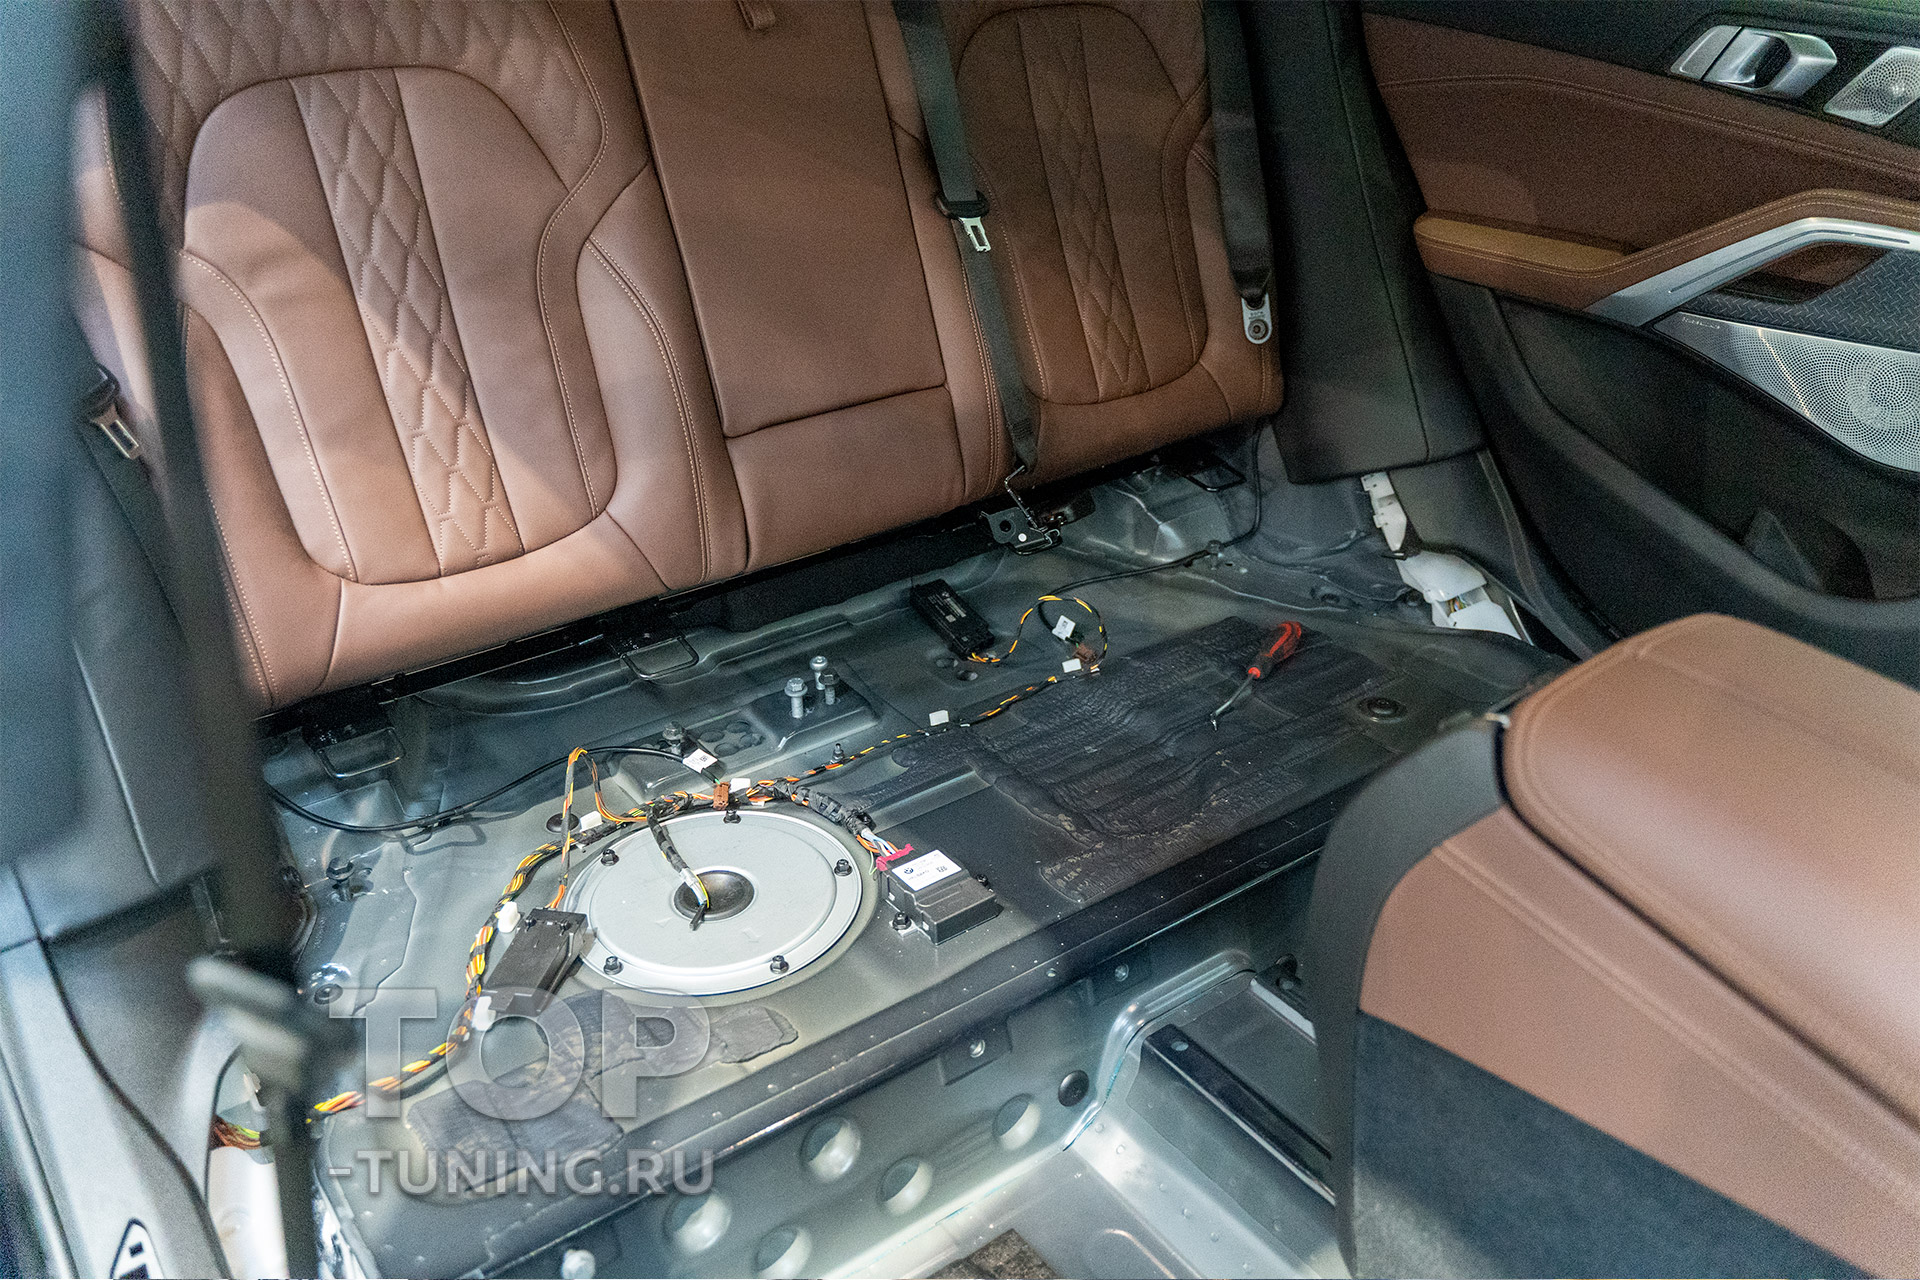 Шумоизоляция нового БМВ Х6 - двери, пол. Перед началом работ